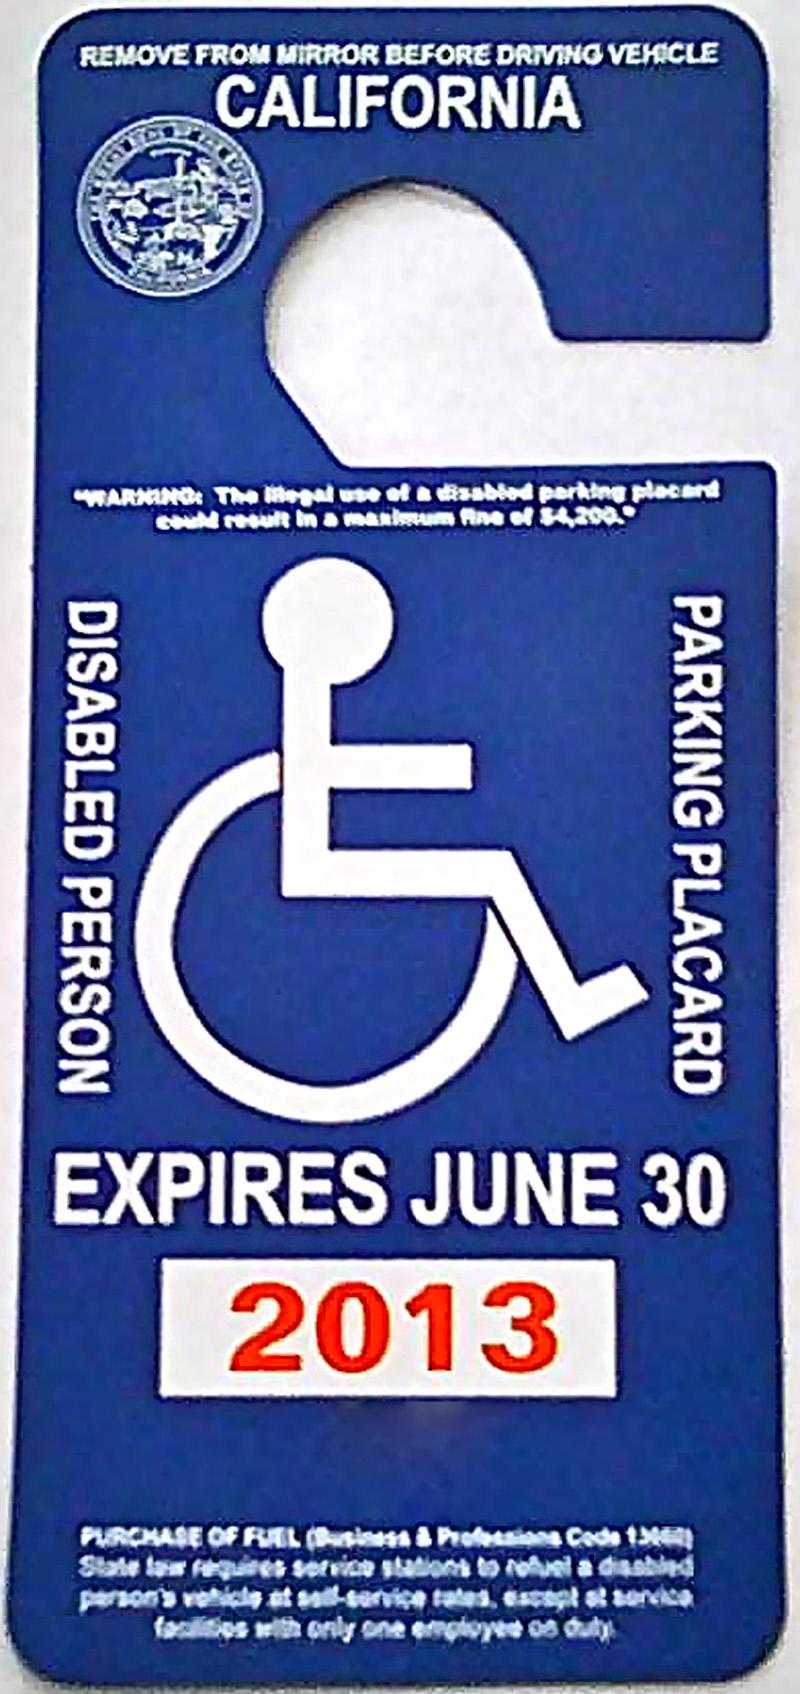 Handicap Plate Permit For Rhode Island